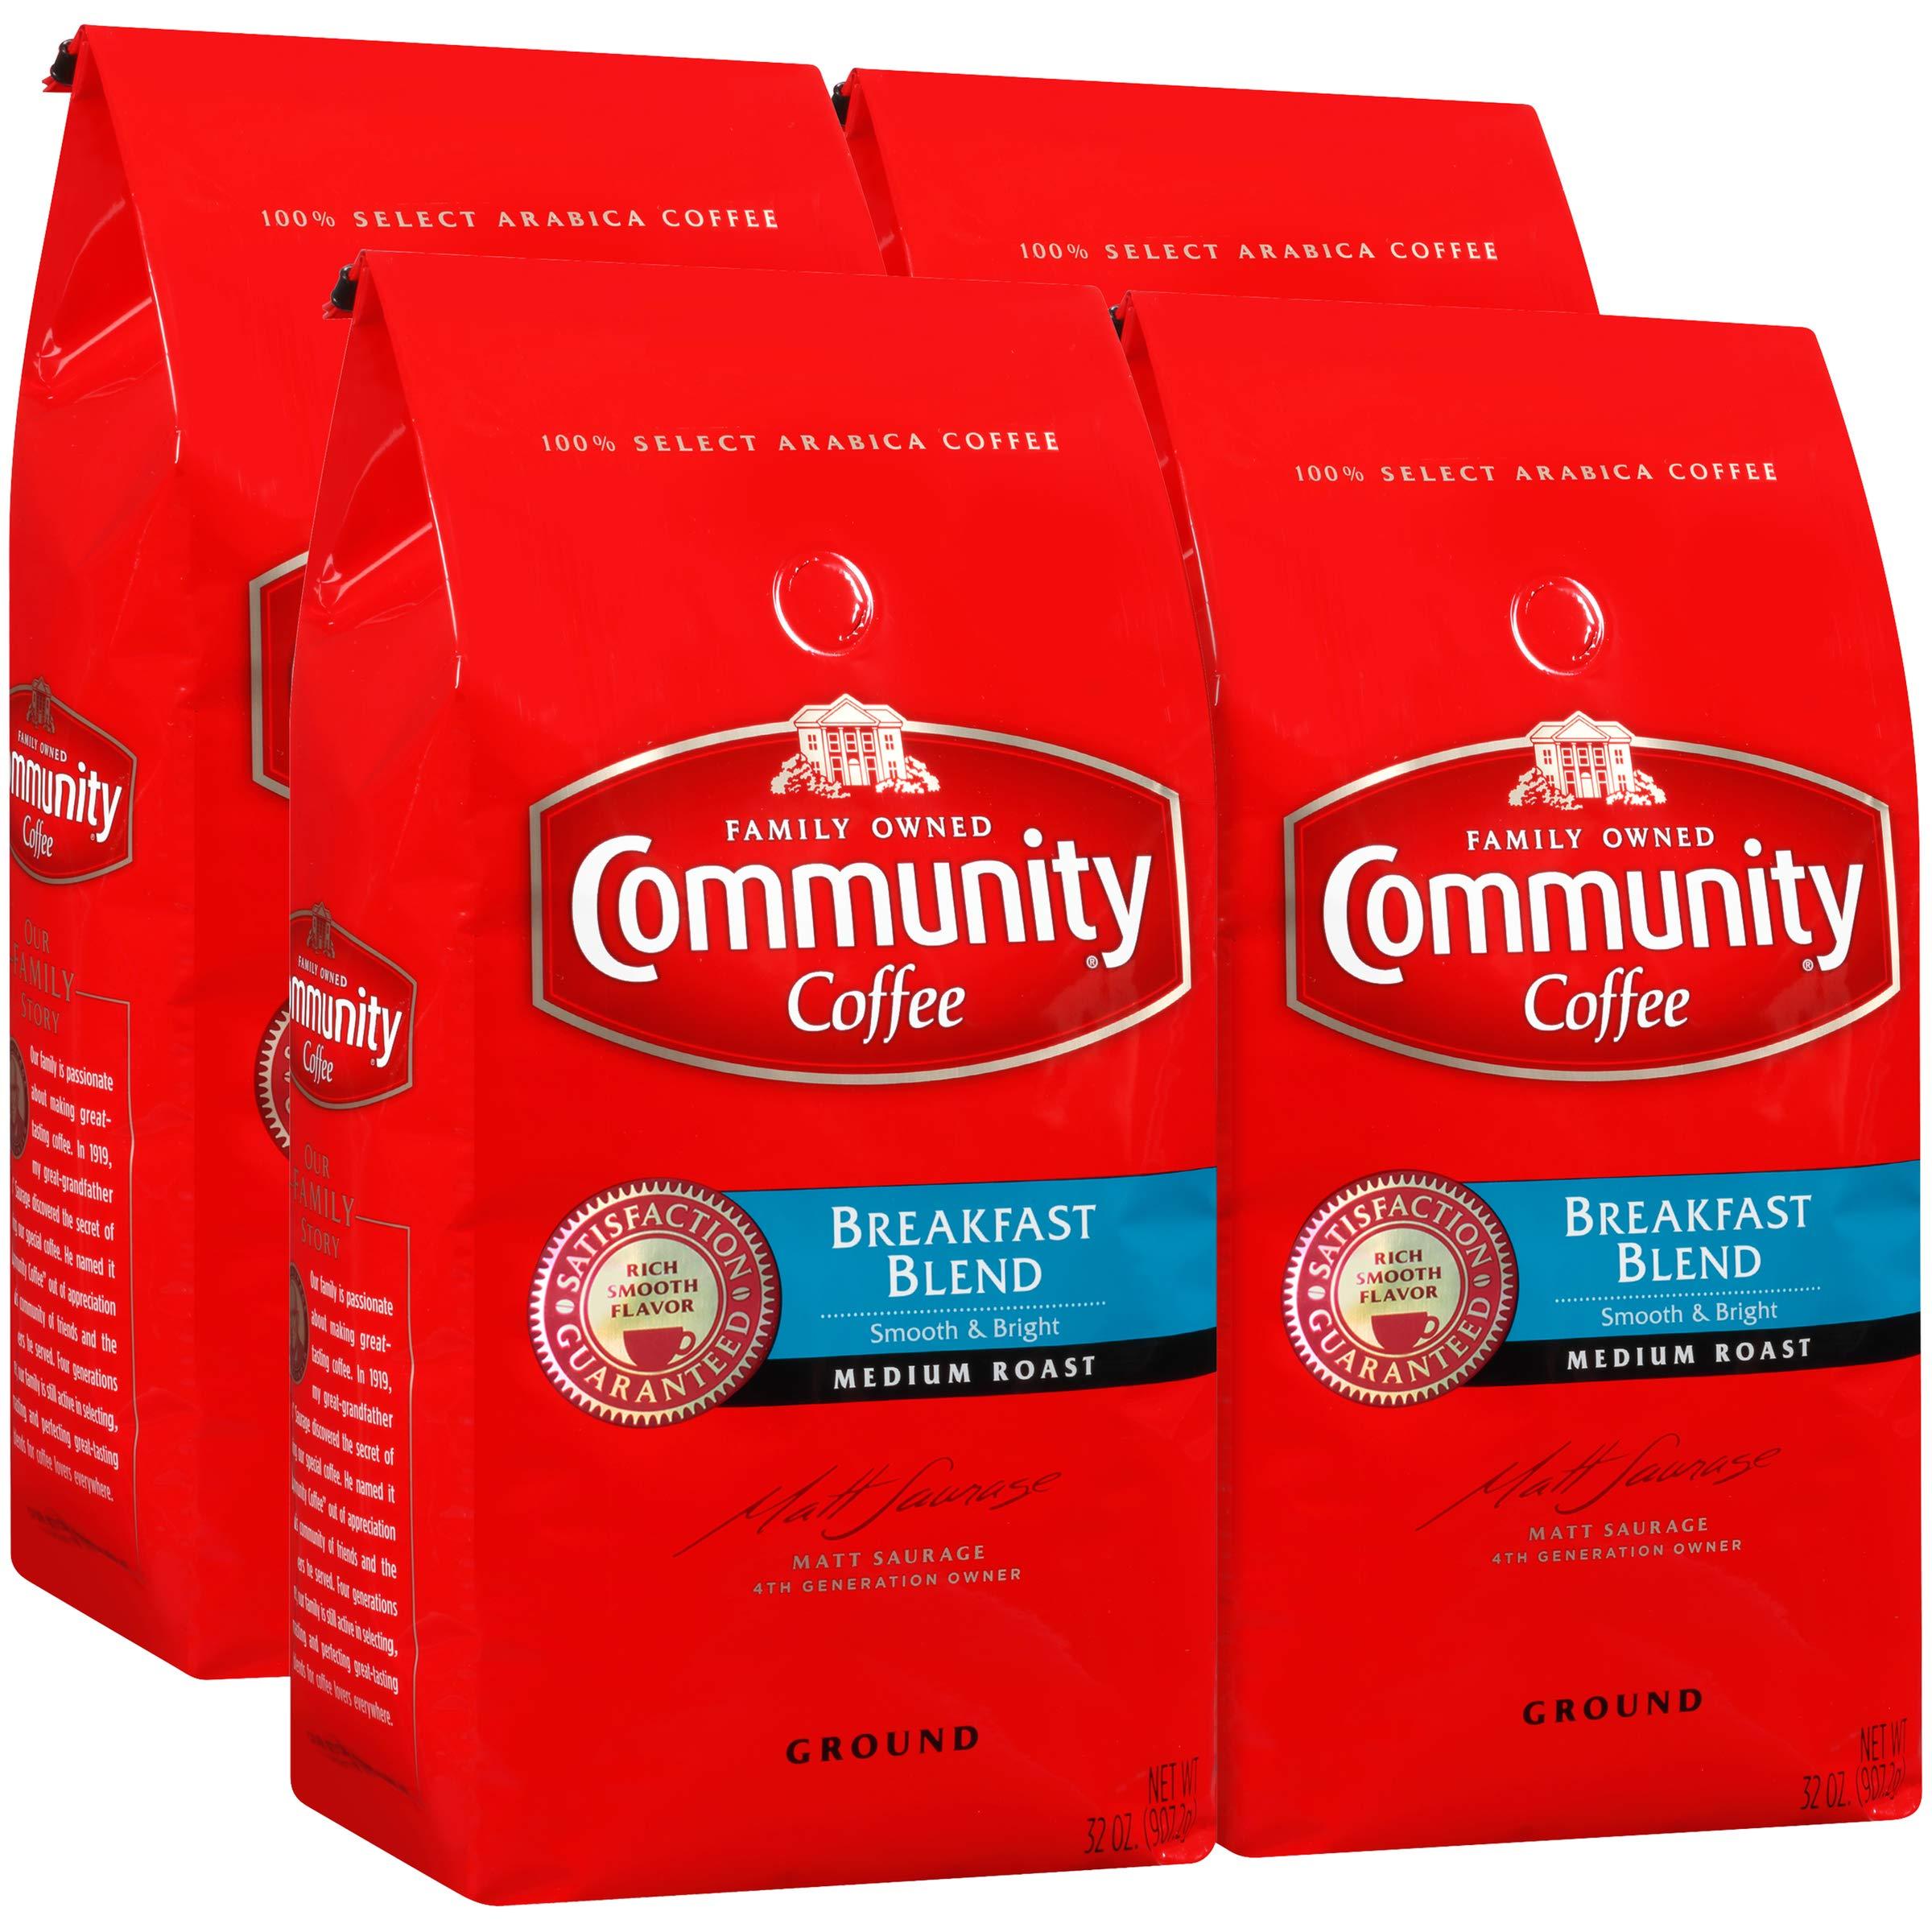 Community Coffee Breakfast Blend Medium Roast Premium Ground 32 Oz Bag (4 Pack), Medium Full Body Smooth Bright Taste, 100% Select Arabica Coffee Beans by Community Coffee